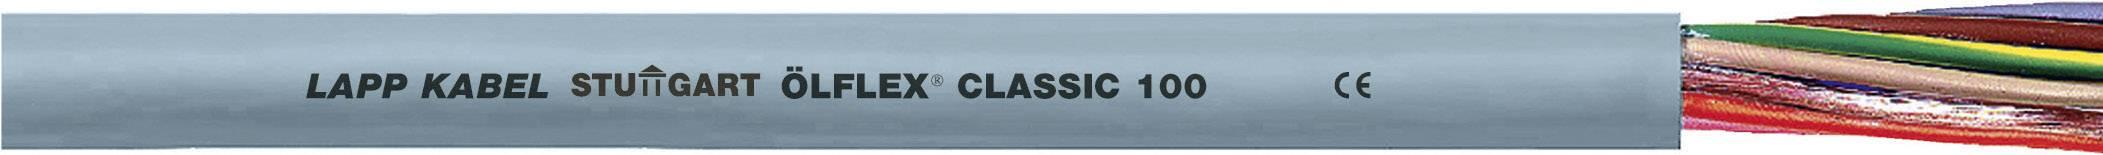 Kabel LappKabel Ölflex CLASSIC 100 5G4 (00101023), PVC, 13,7 mm, 750 V, šedá, 500 m